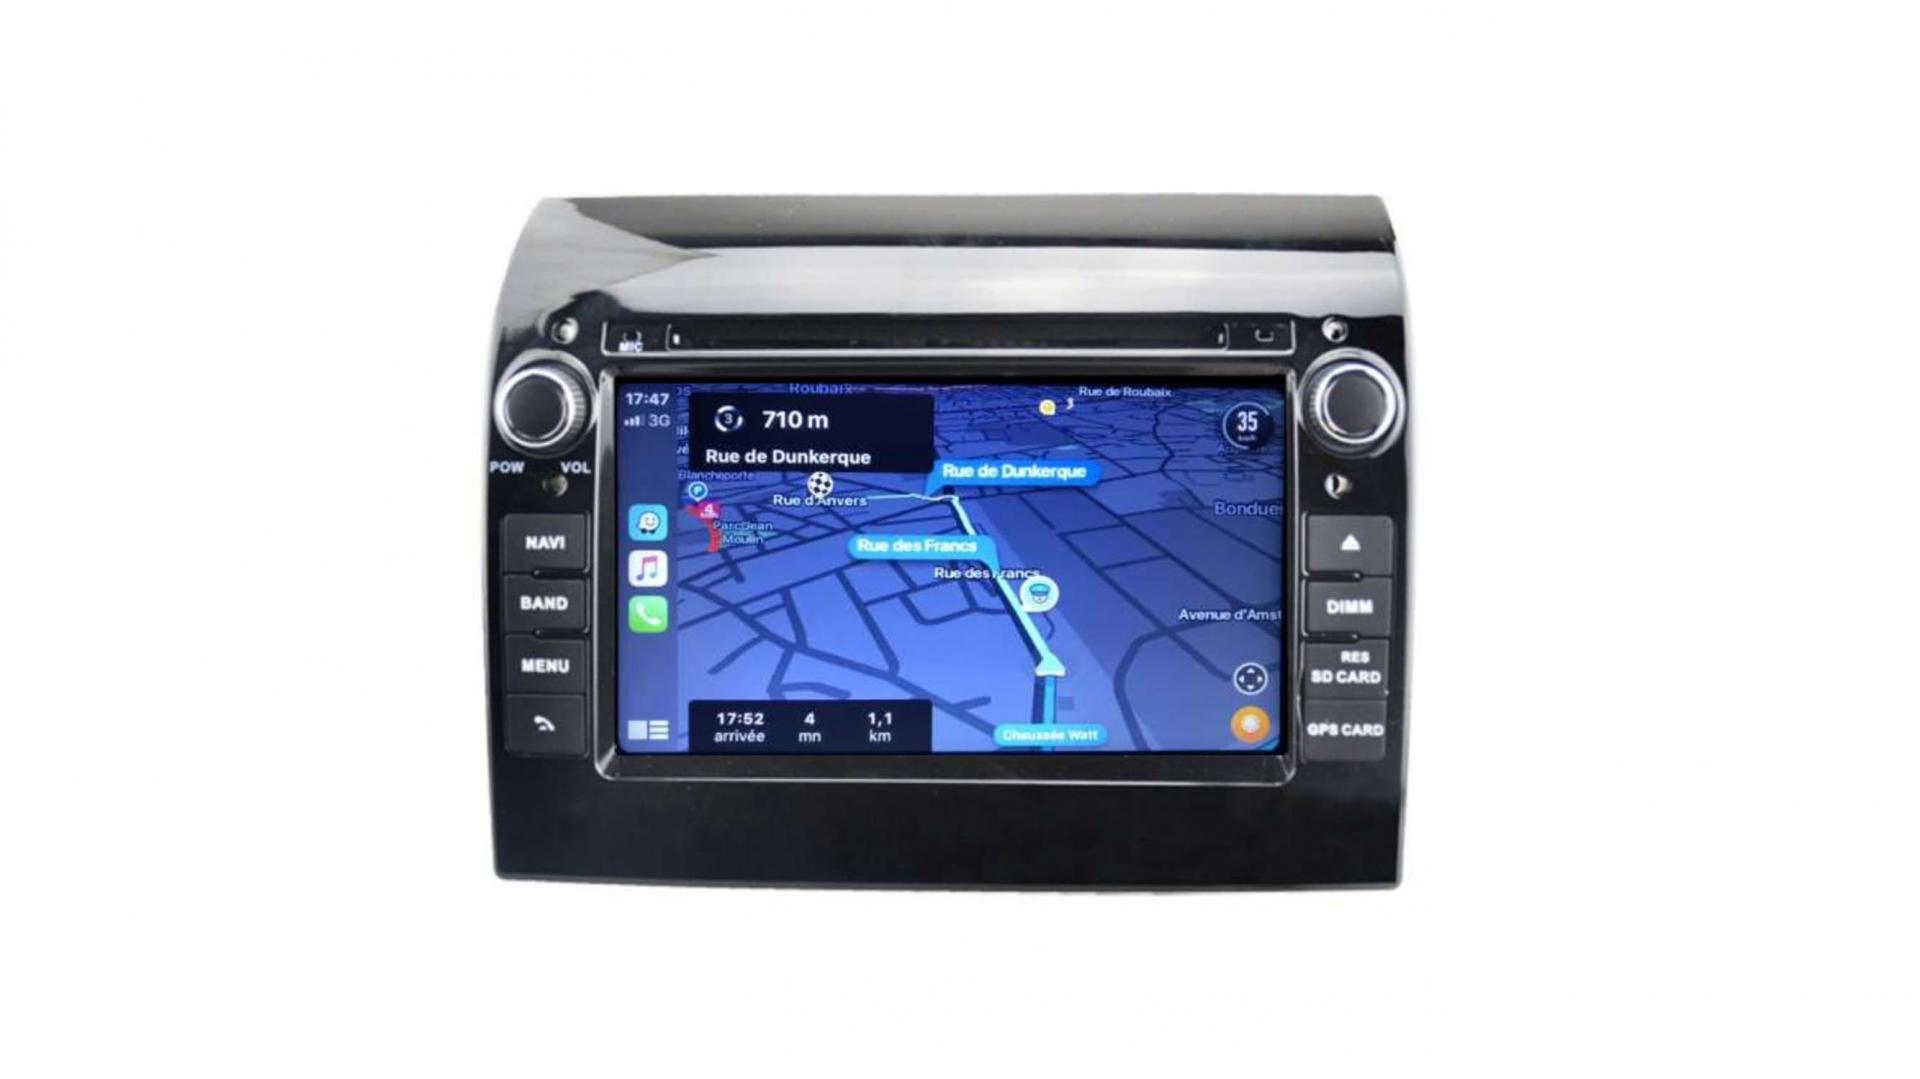 Fiat ducato autoradio gps bluetooth android auto carplay camera de recul commande au volant4 1